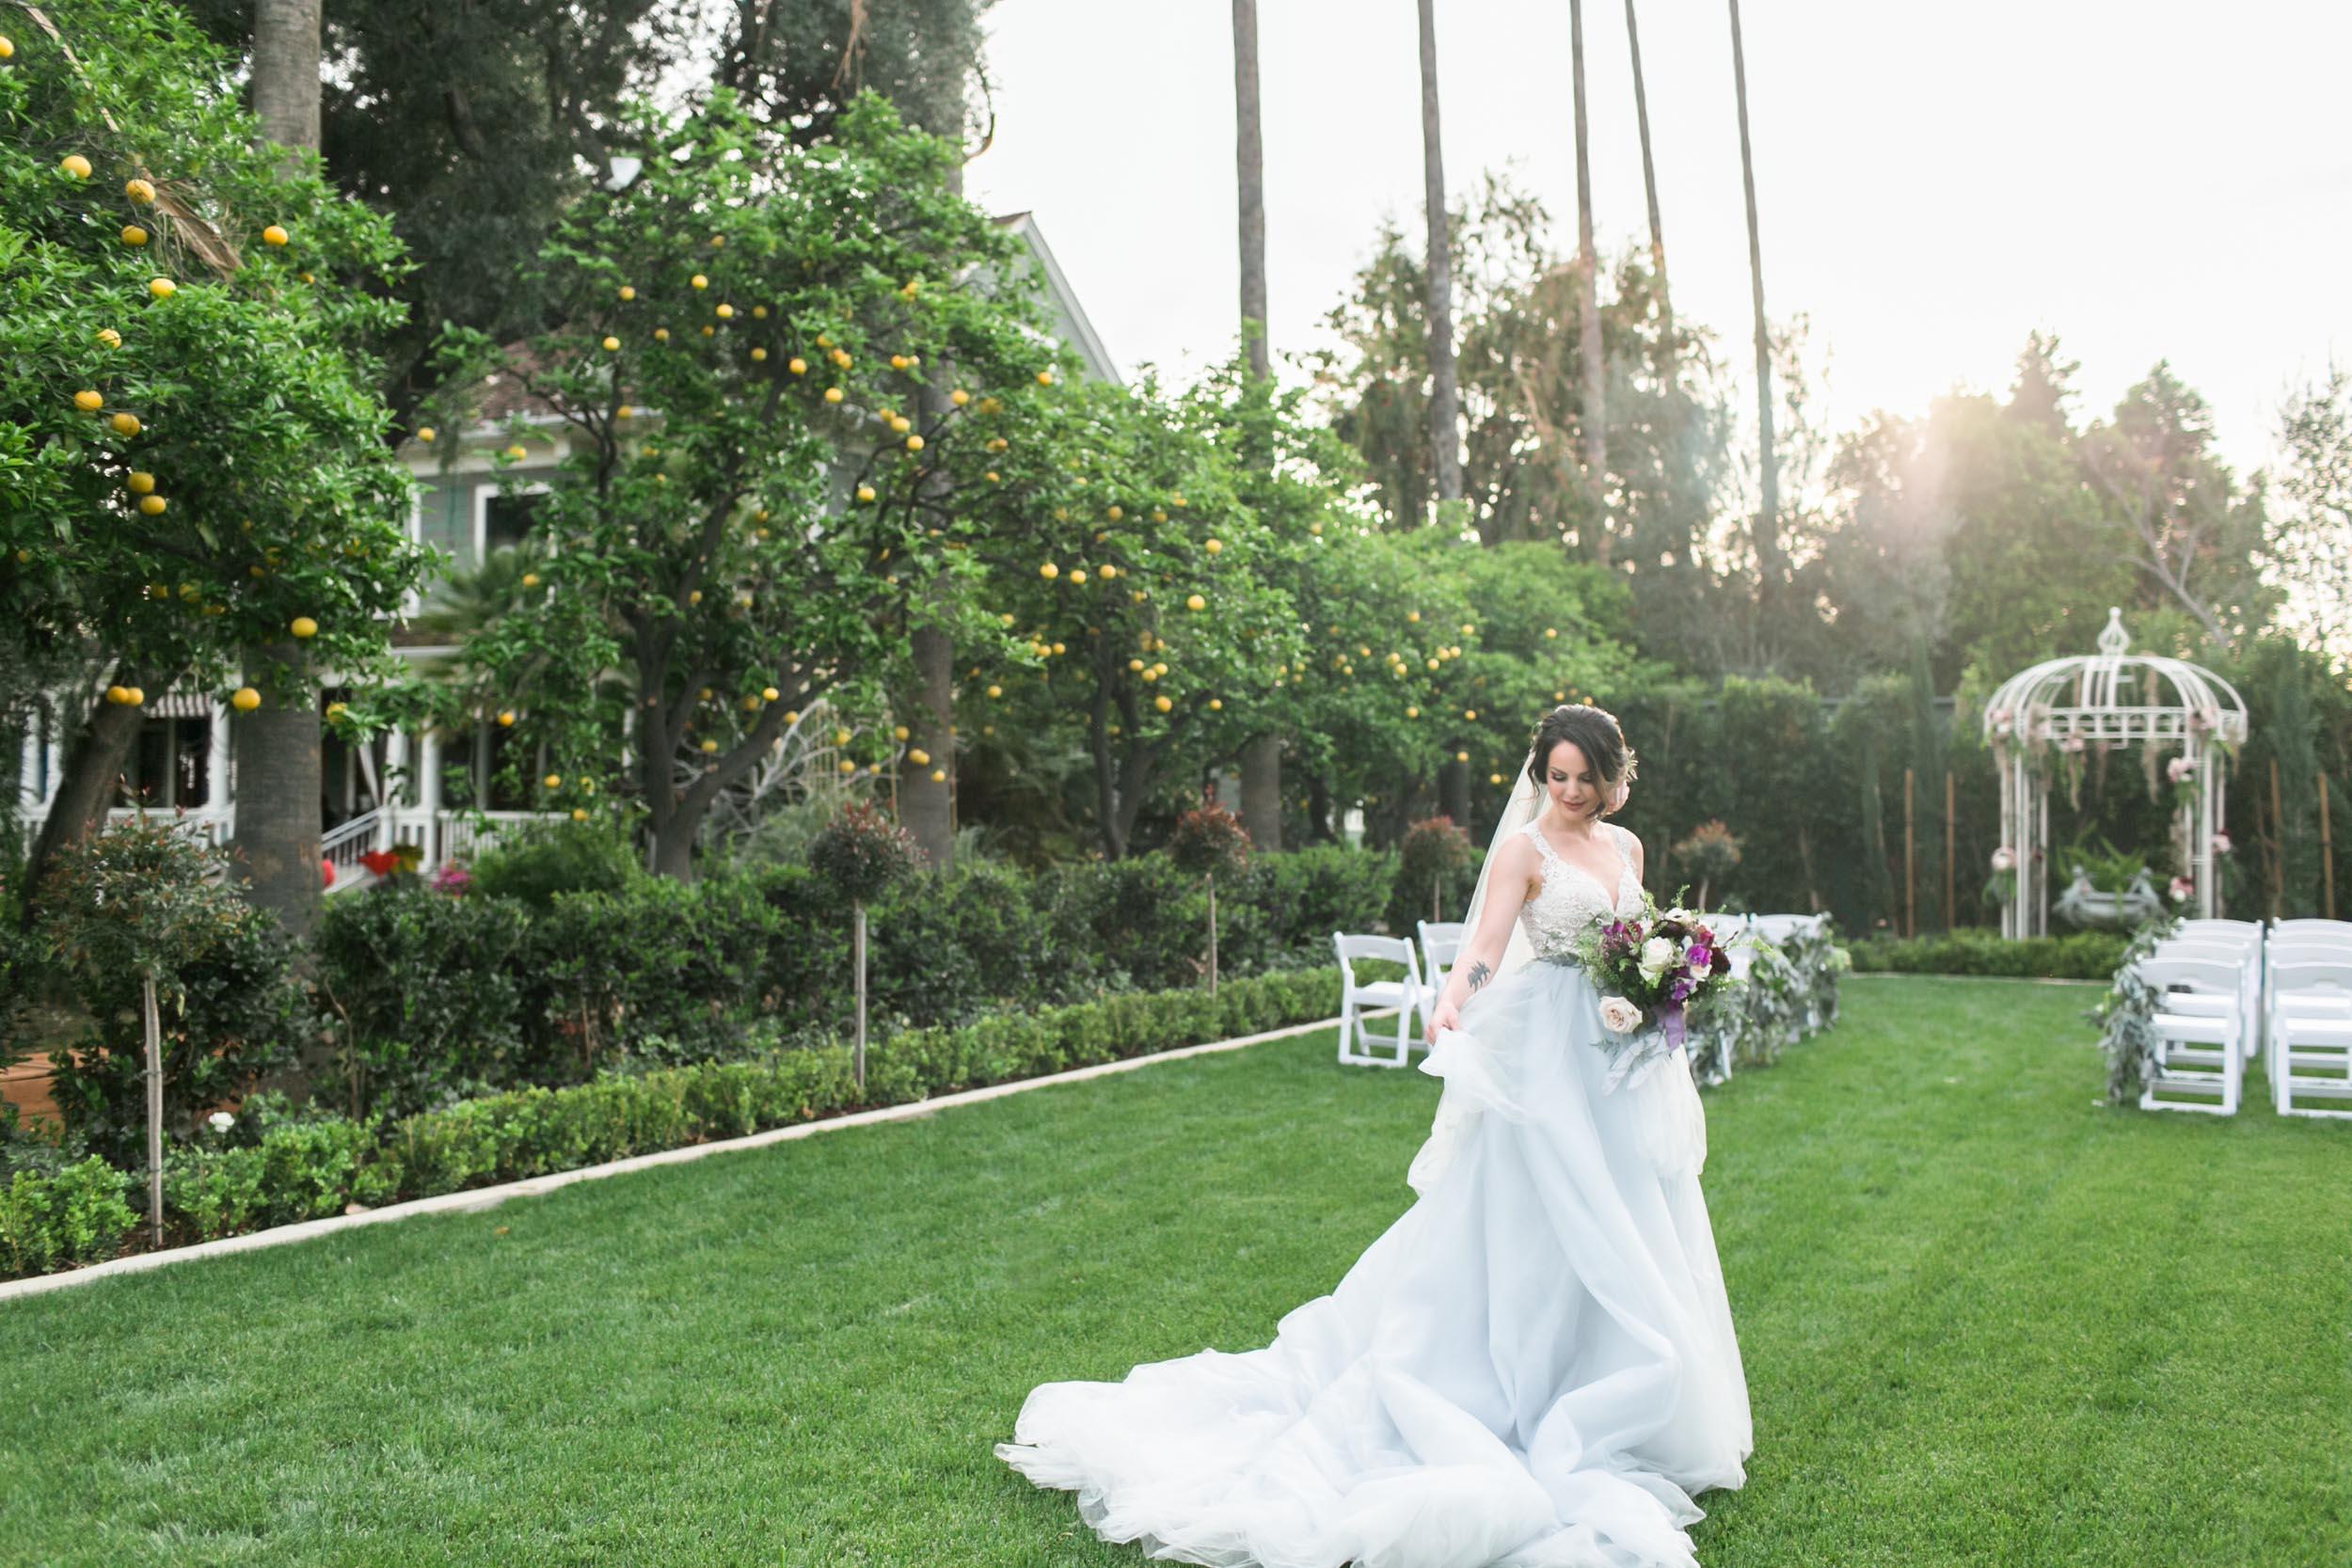 christmas-house-wedding-venue-white-garden-bridal-portraits-carrie-vines-108.jpg